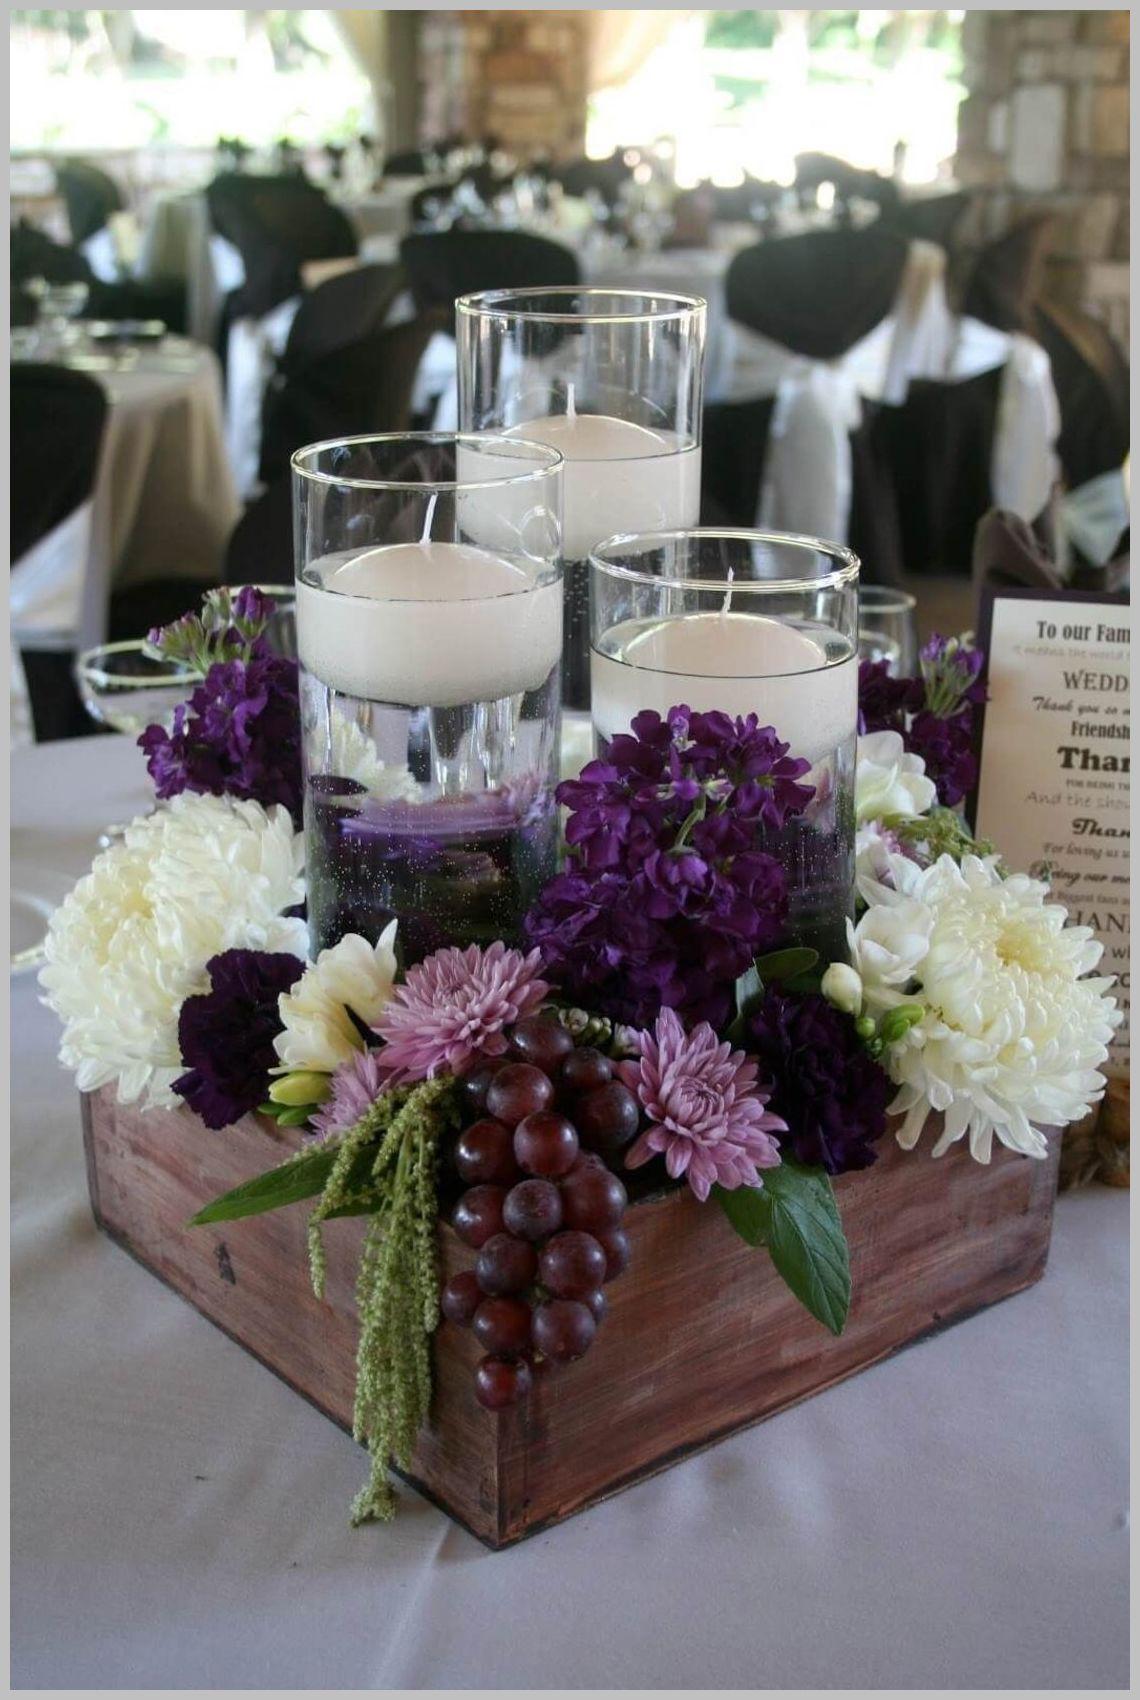 Wedding centerpieces how to make cheap wedding centerpieces for